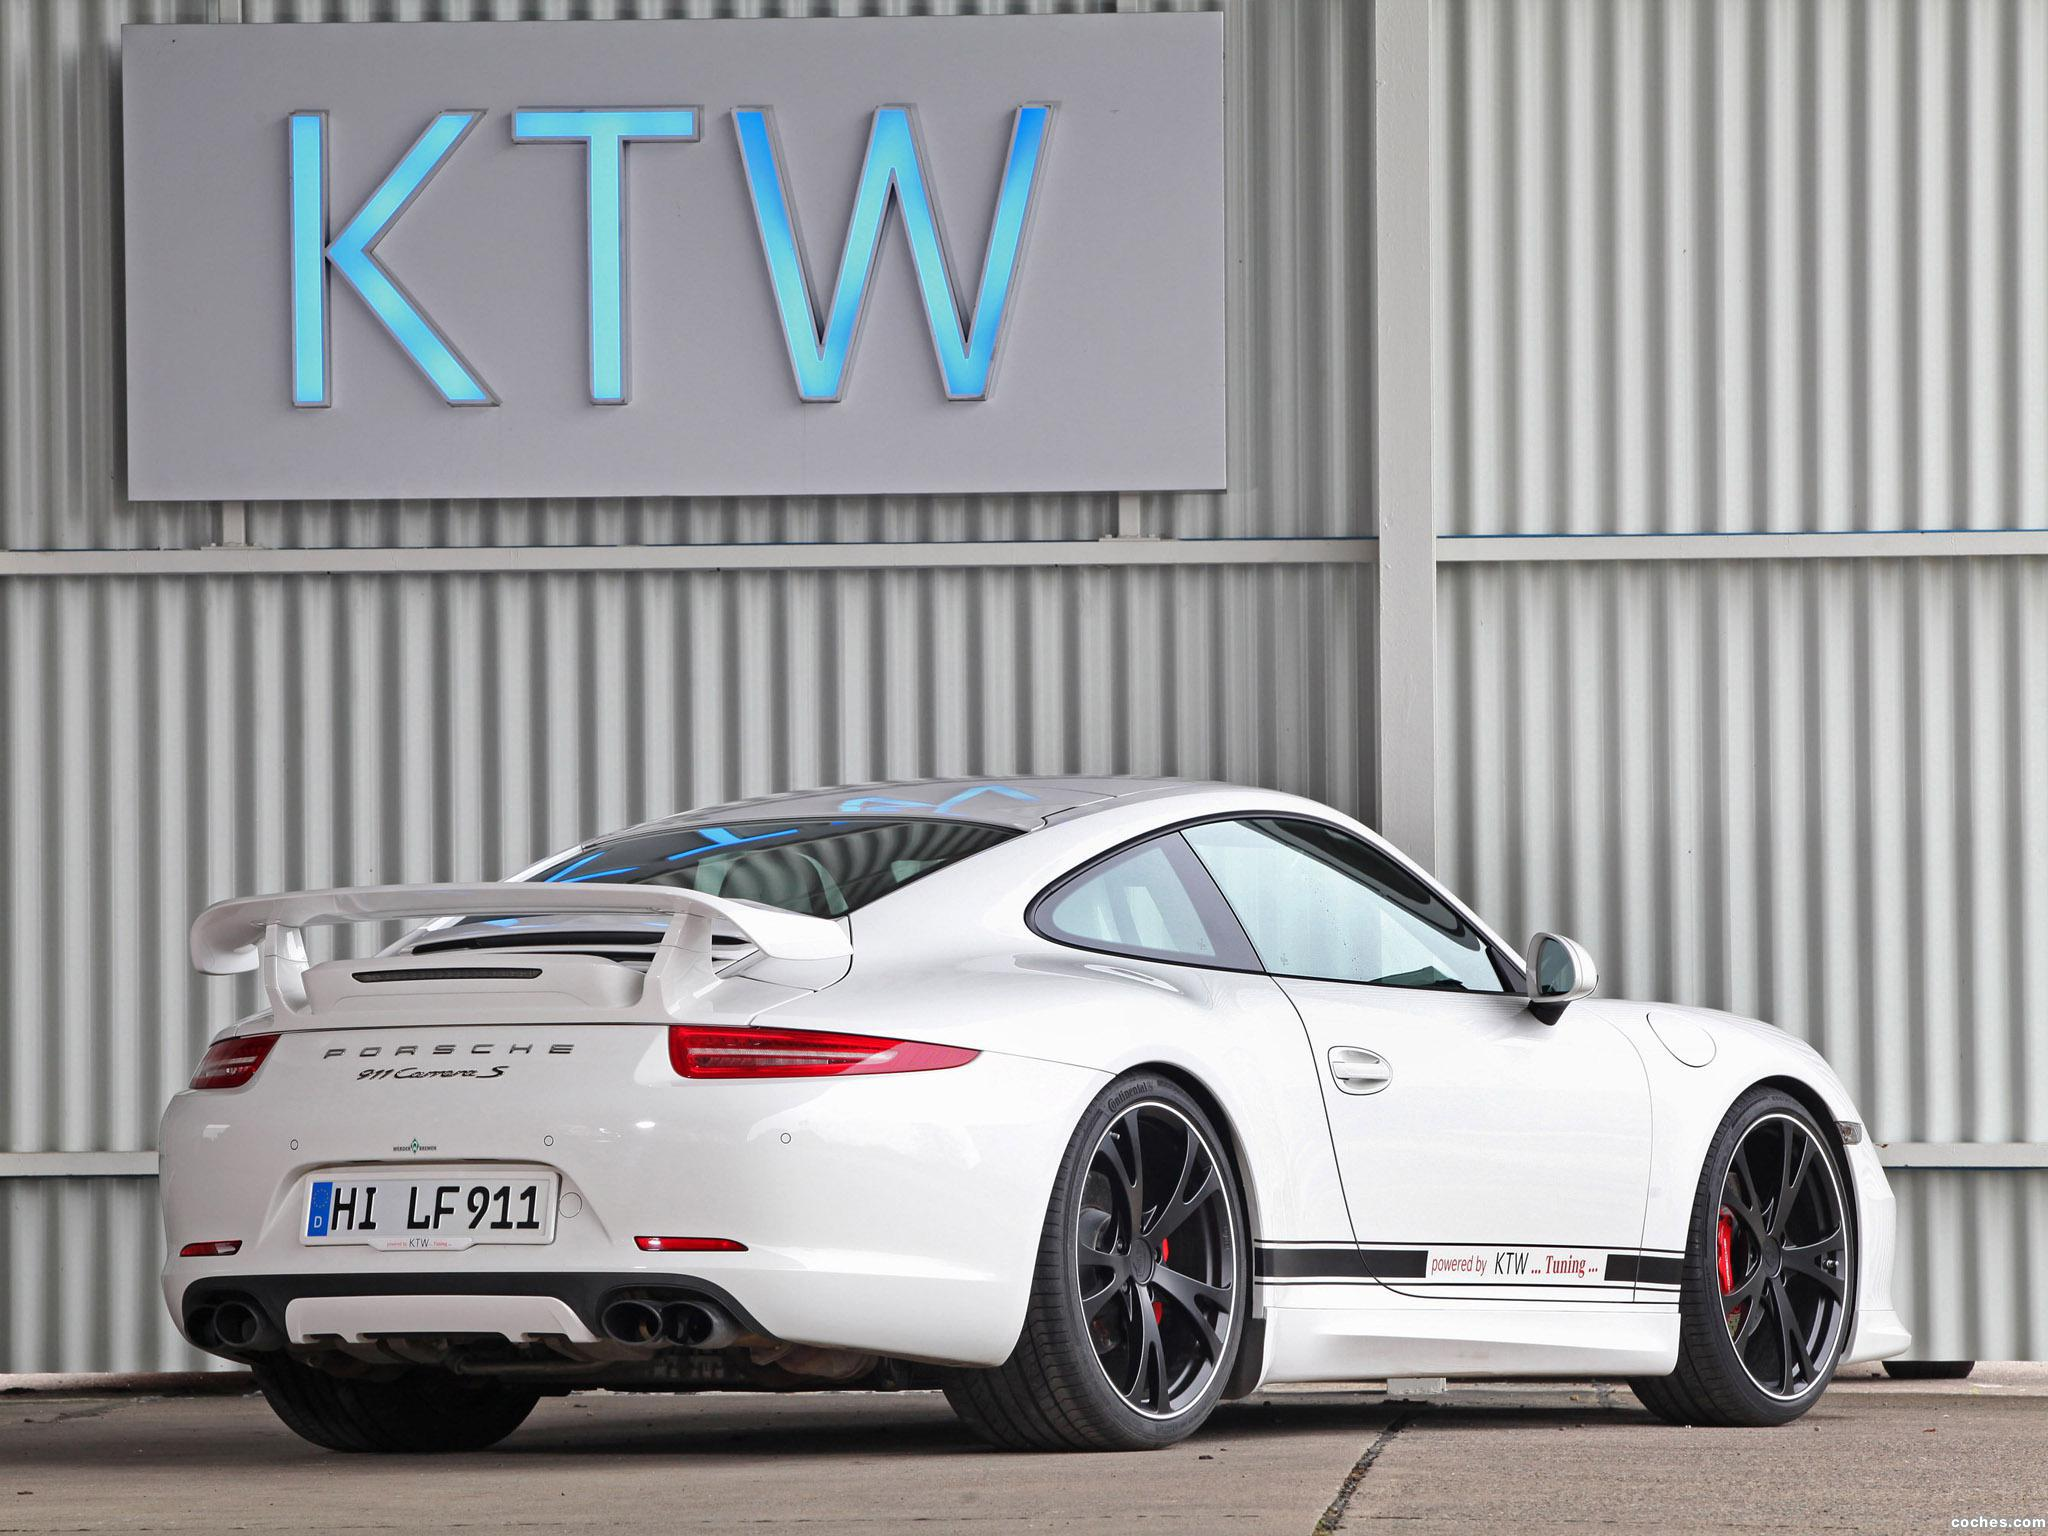 Foto 4 de KTW Porsche Carrera S 991 2013